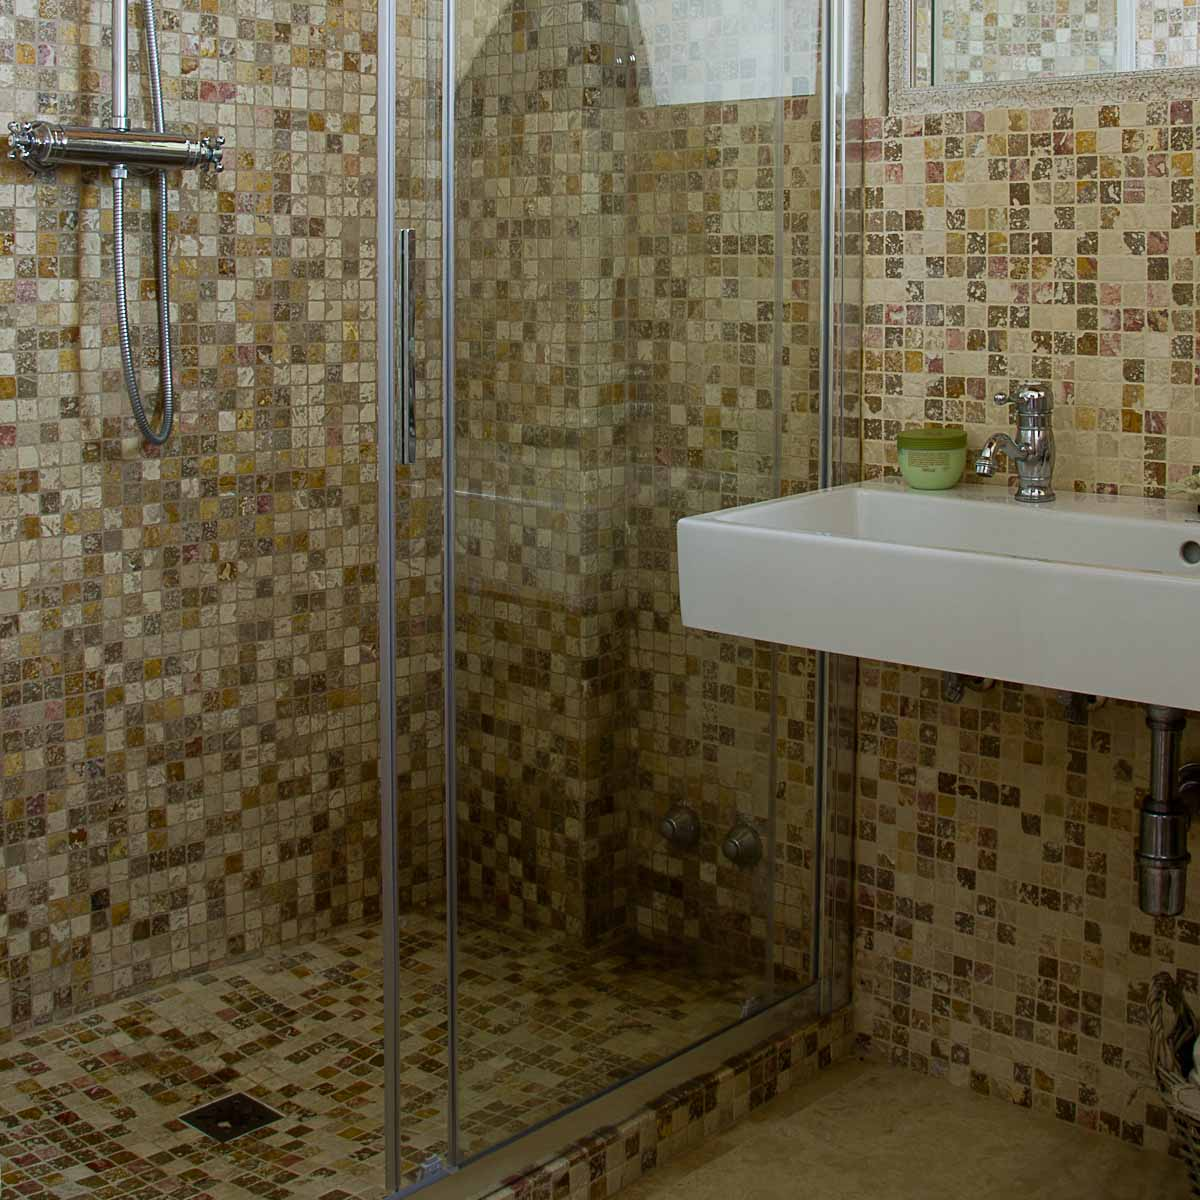 Lampadari febo classici - Mosaici bagno prezzi ...